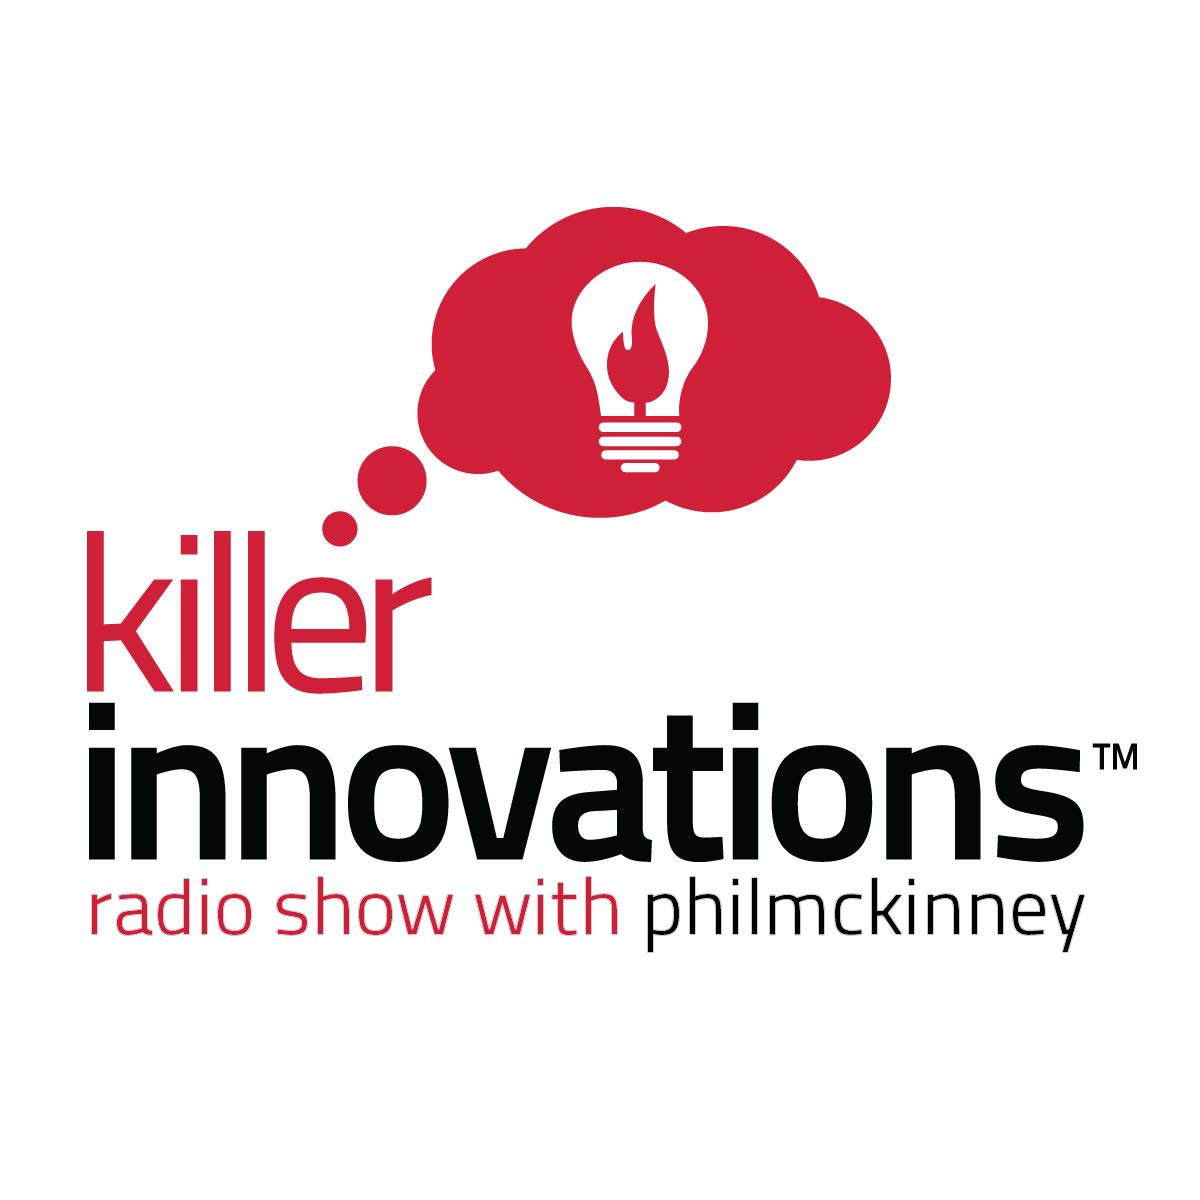 Talk Radio Show on Ideas Creativity and Innovation